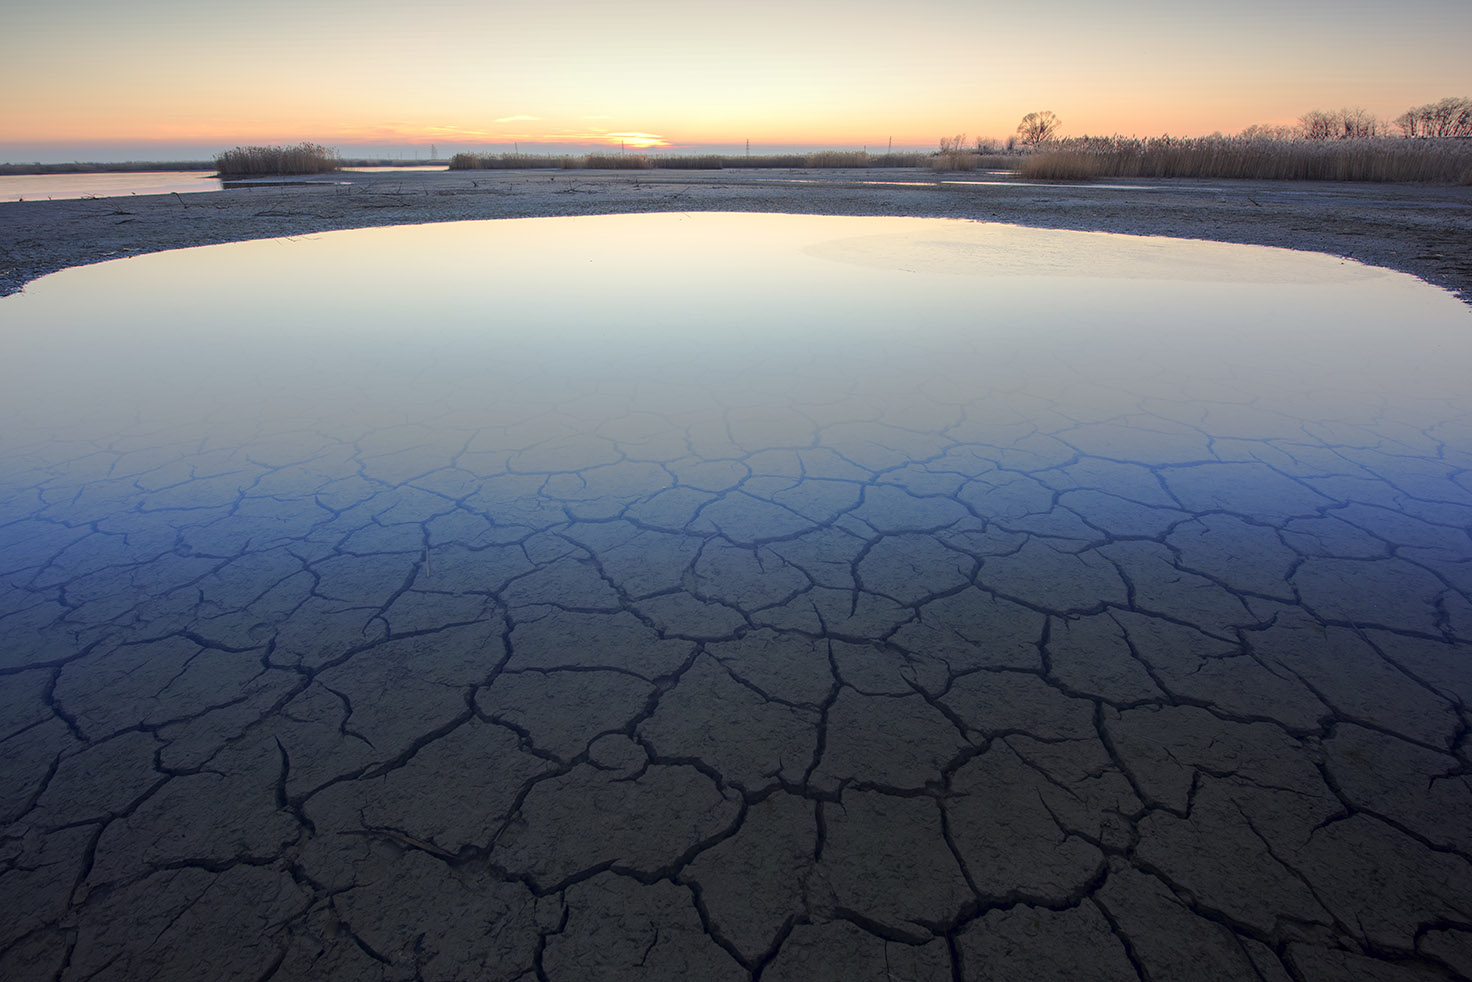 ljd668作品:旱与涝